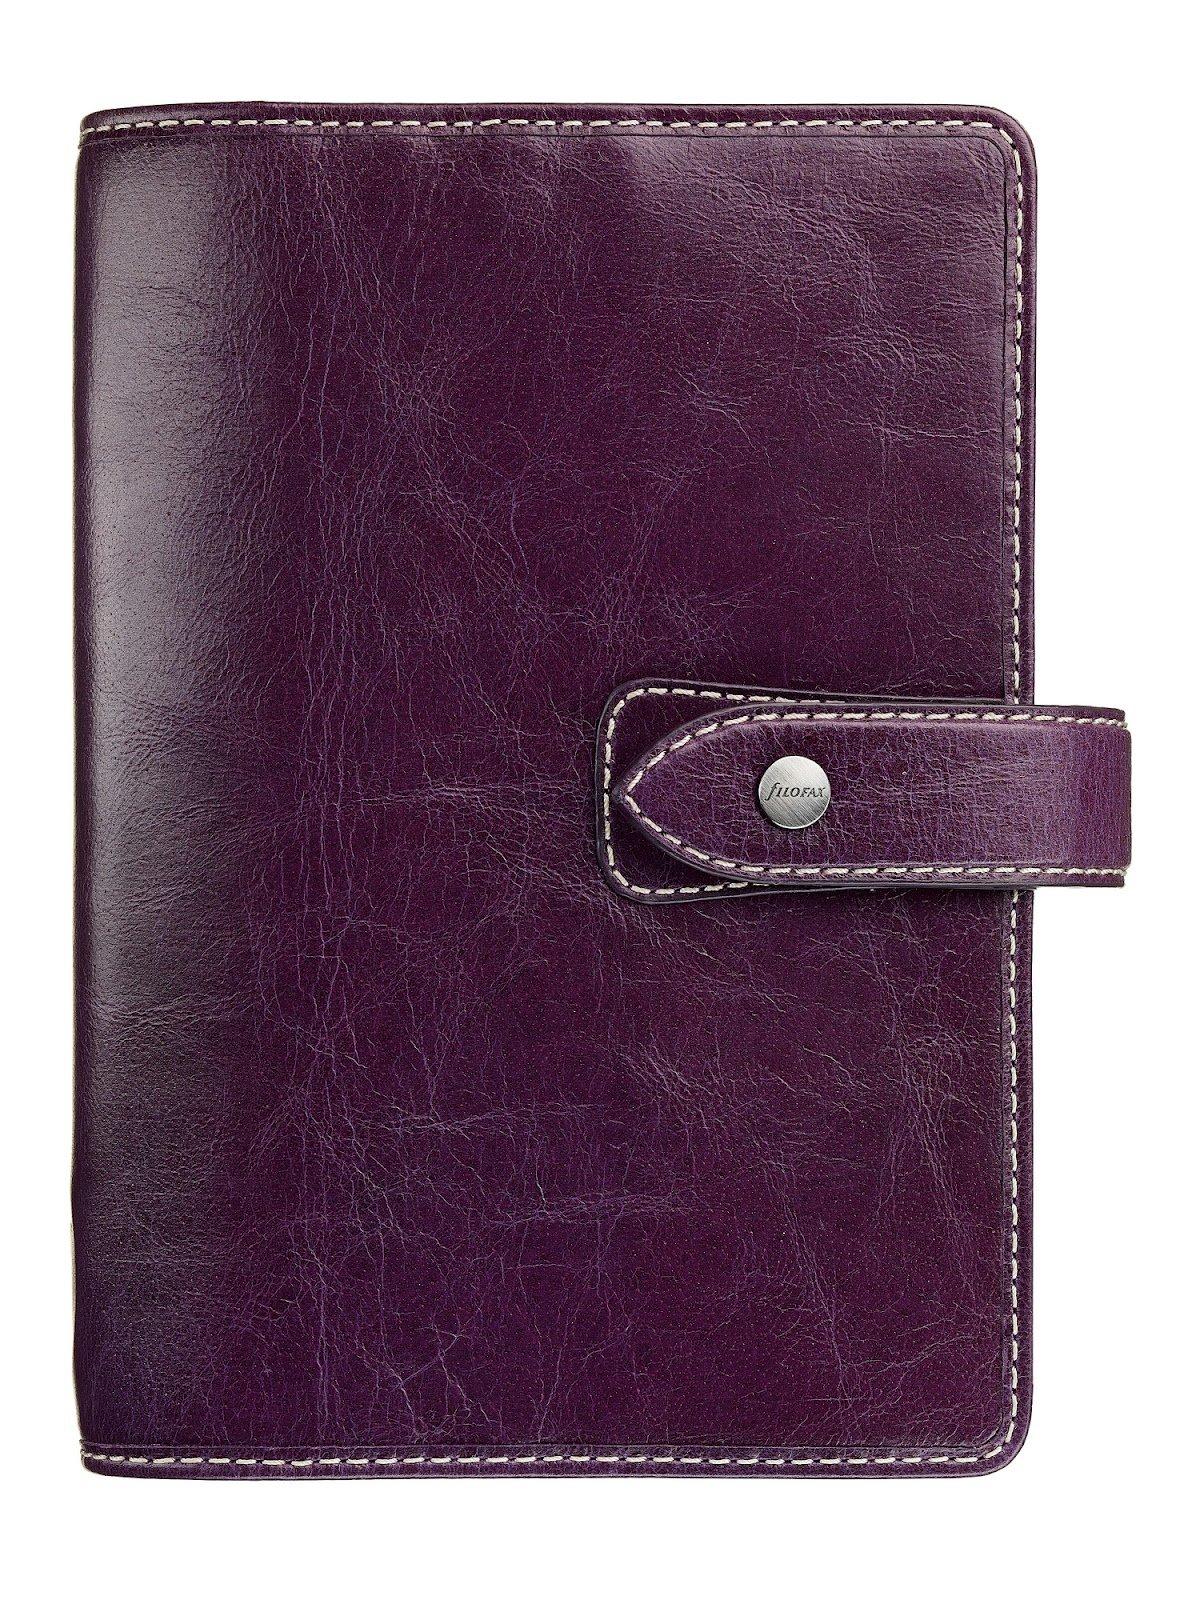 Filofax Malden Personal Purple Vintage leather look organizer Agenda Calendar 025850